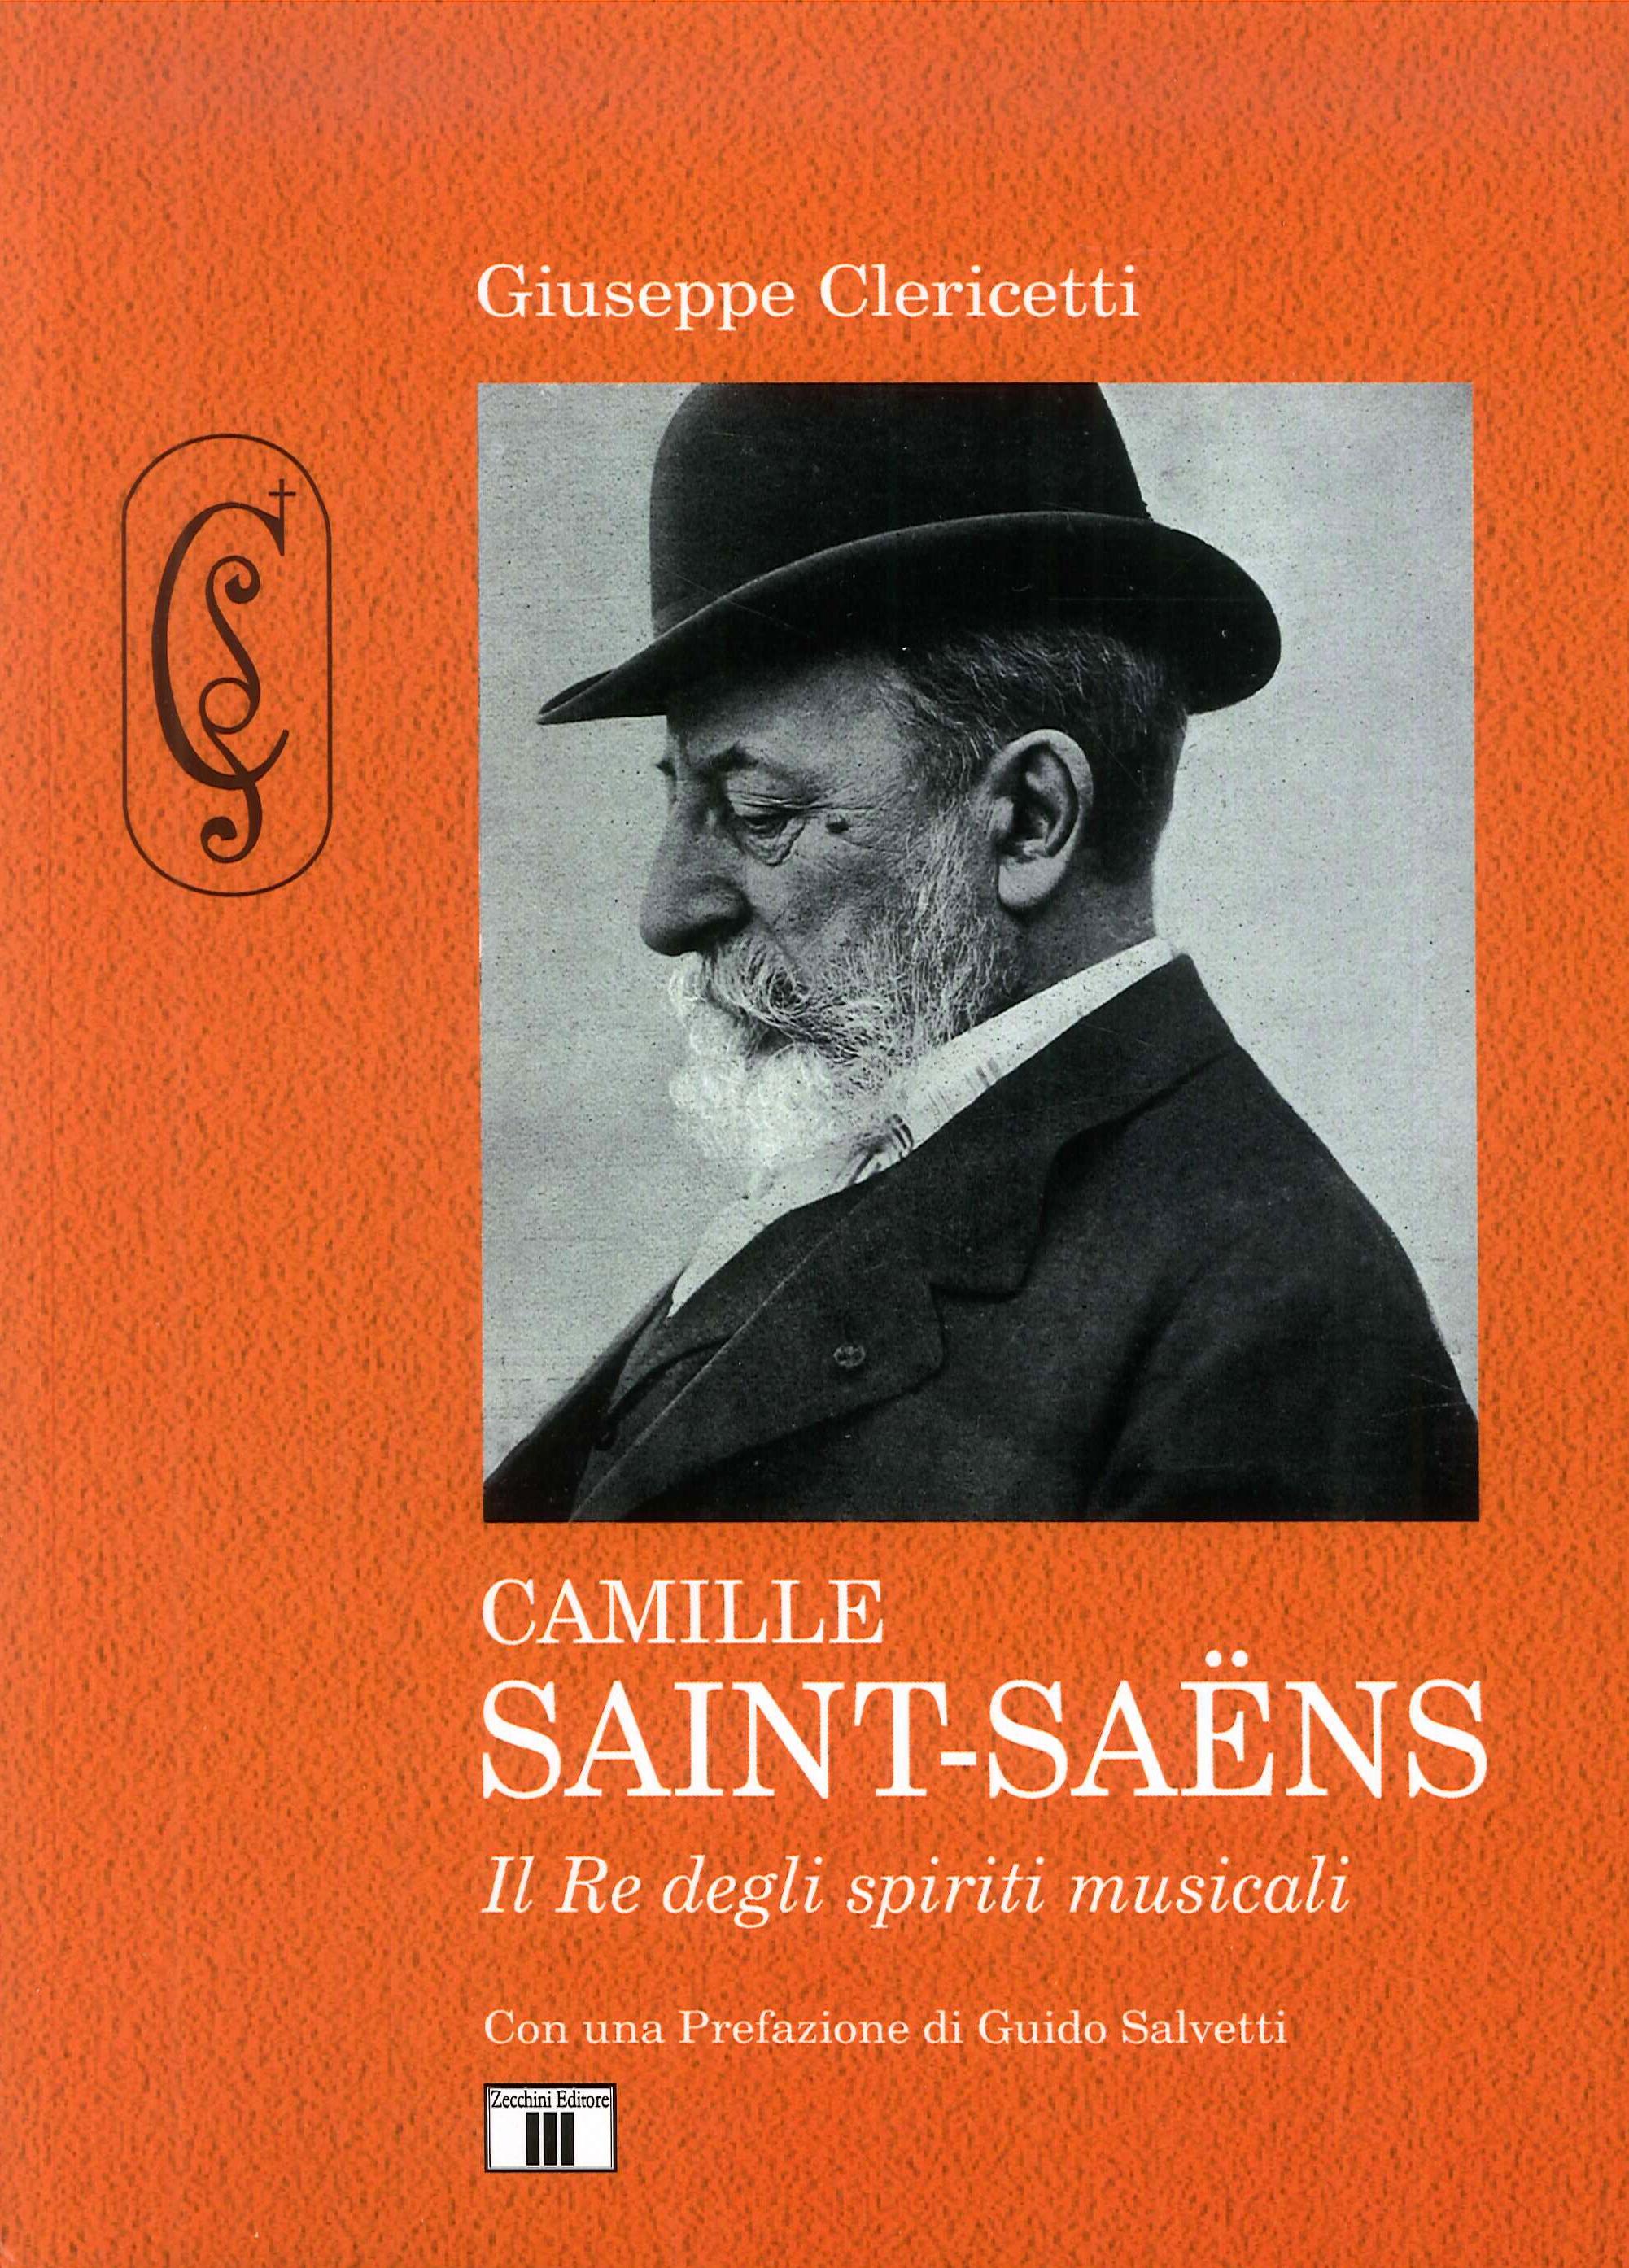 Camille Saint-Saëns. Il re degli spiriti musicali.